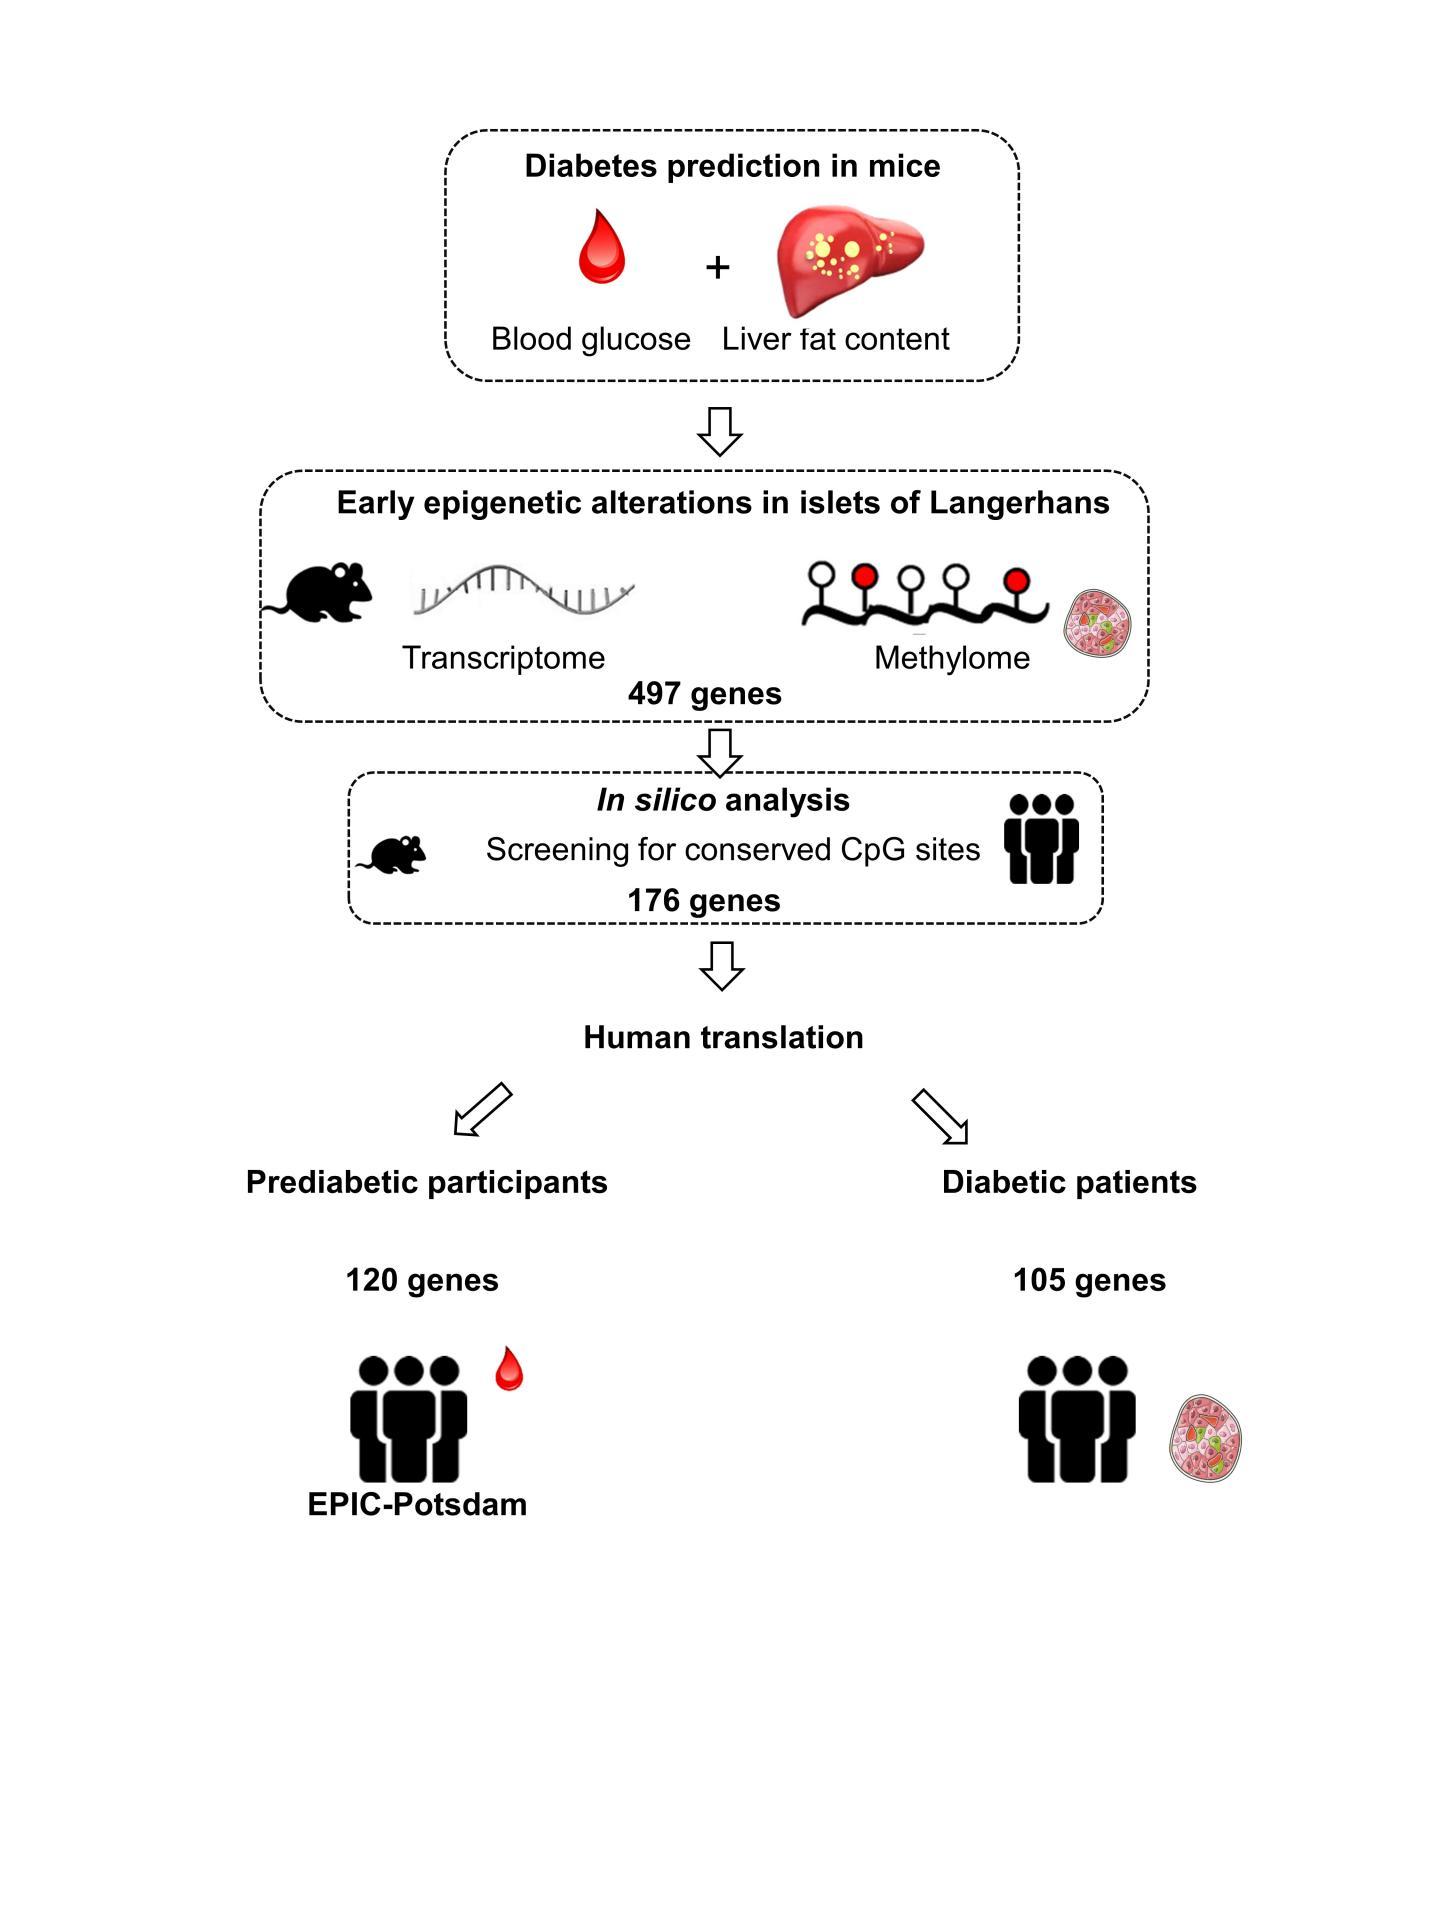 Epigenetic Changes Precede Onset of Diabetes